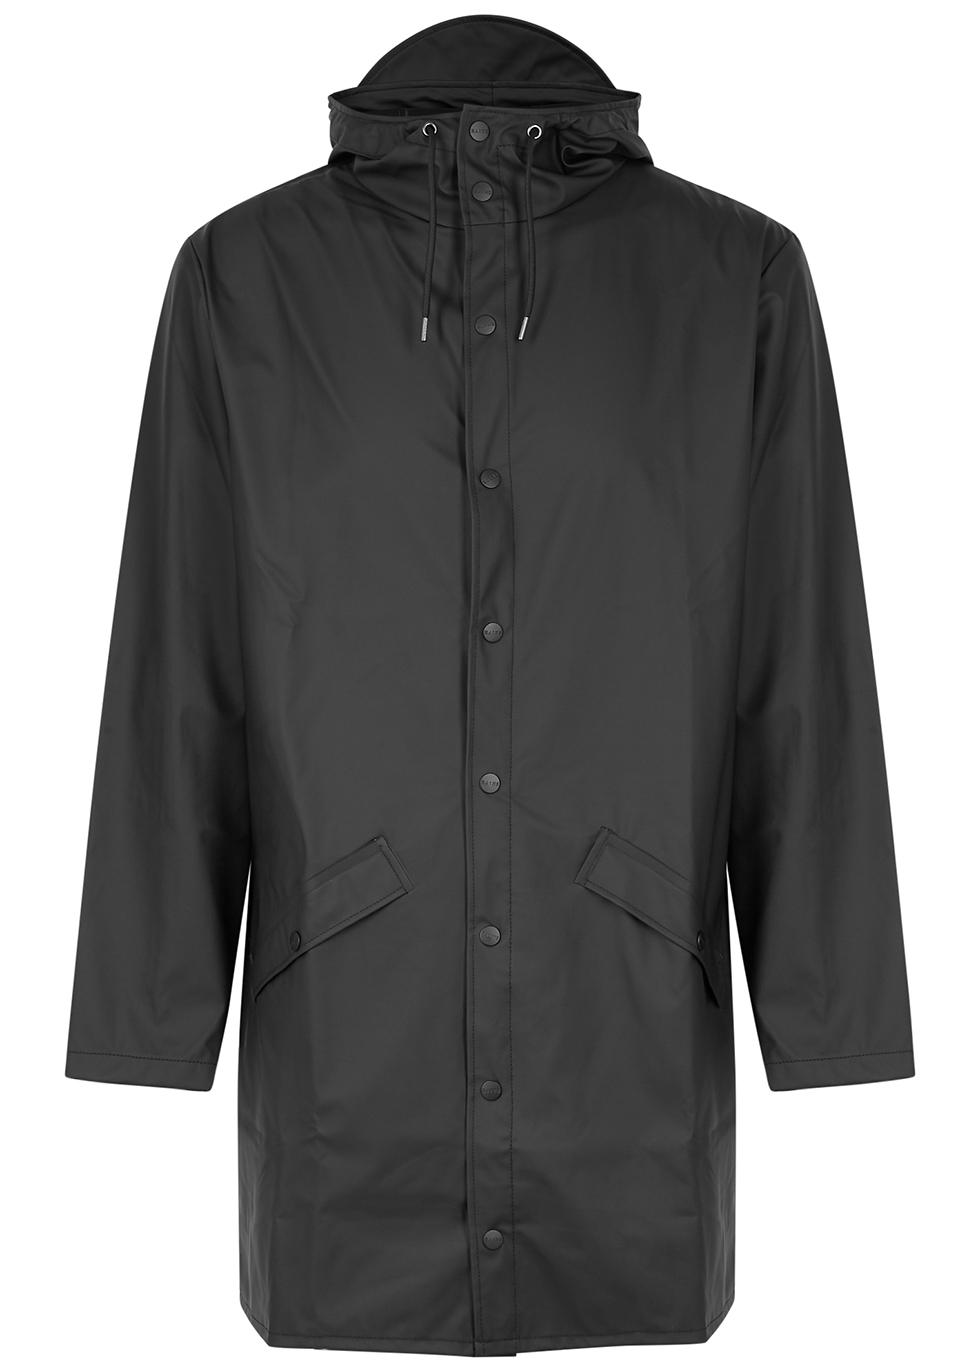 Matte black rubberised raincoat